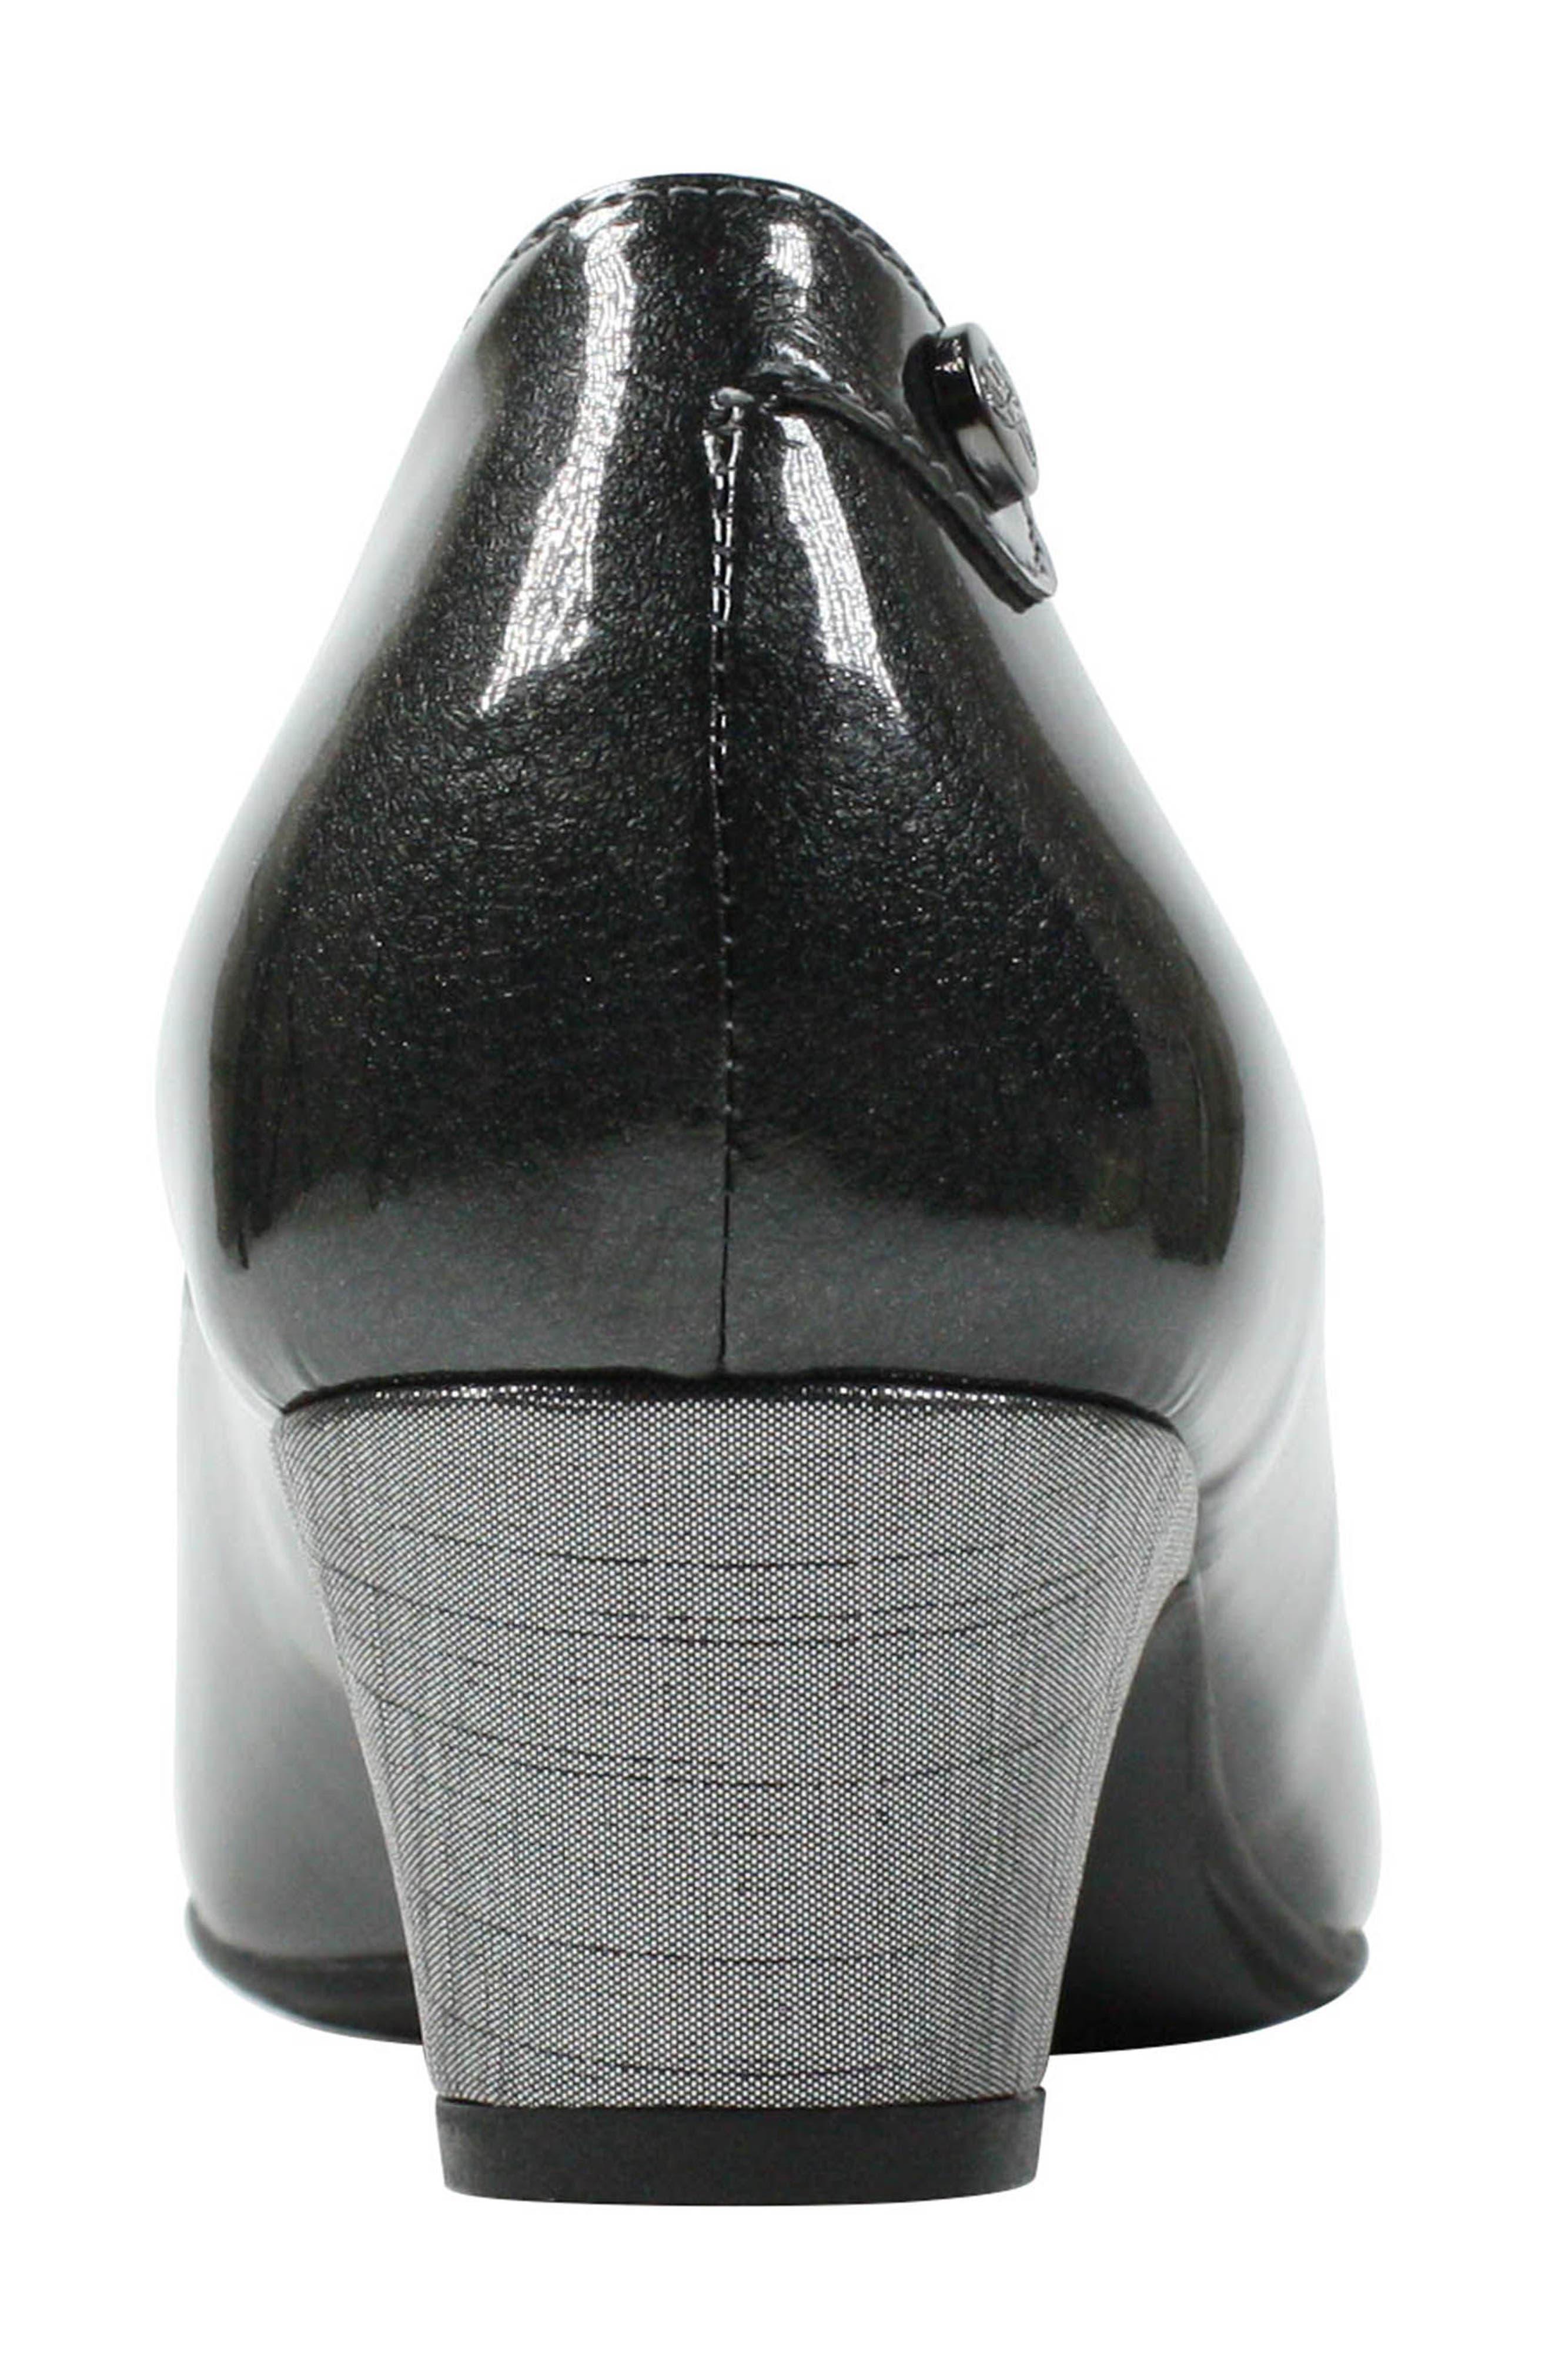 Prattsi Pump,                             Alternate thumbnail 4, color,                             Pewter Patent Leather